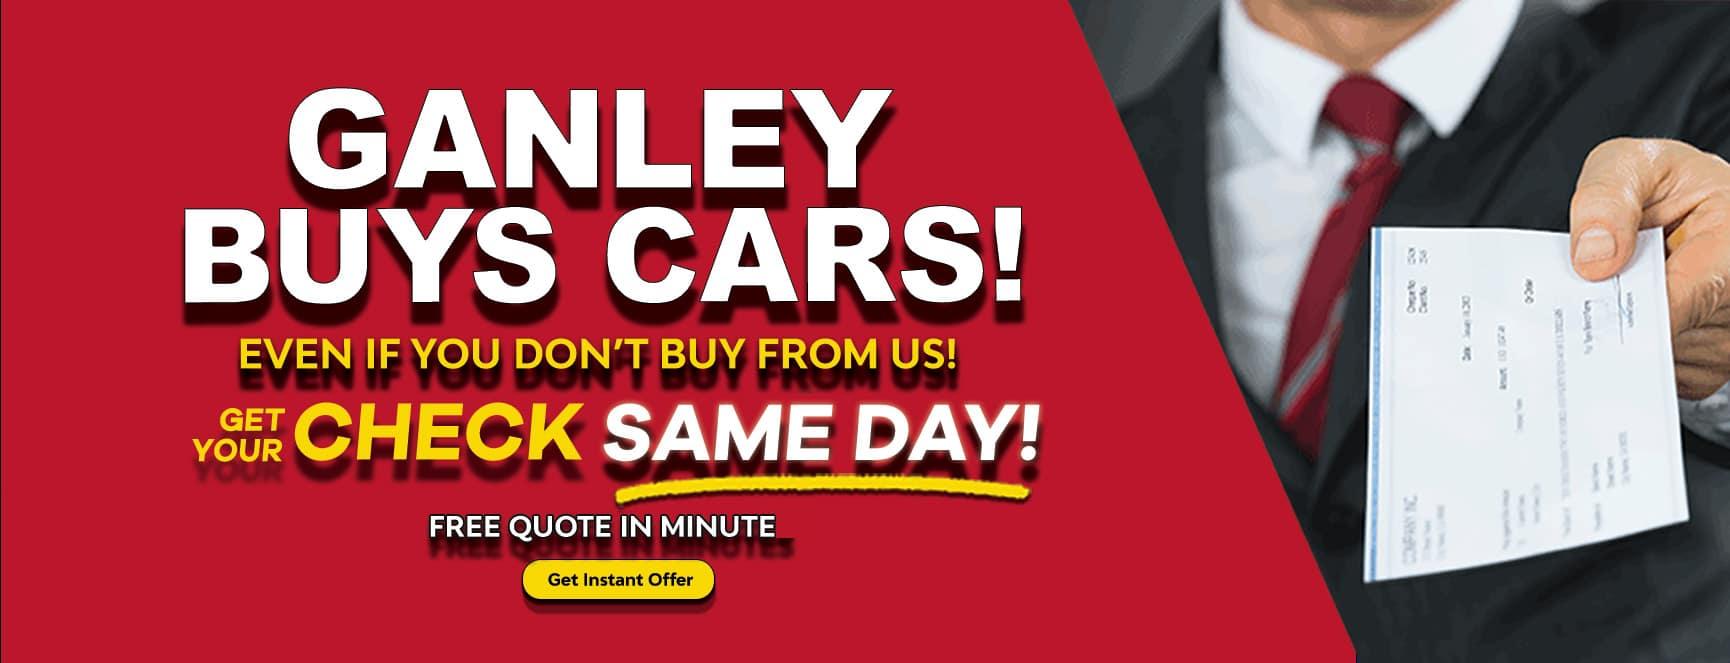 Ganley Buys Cars Value Trade